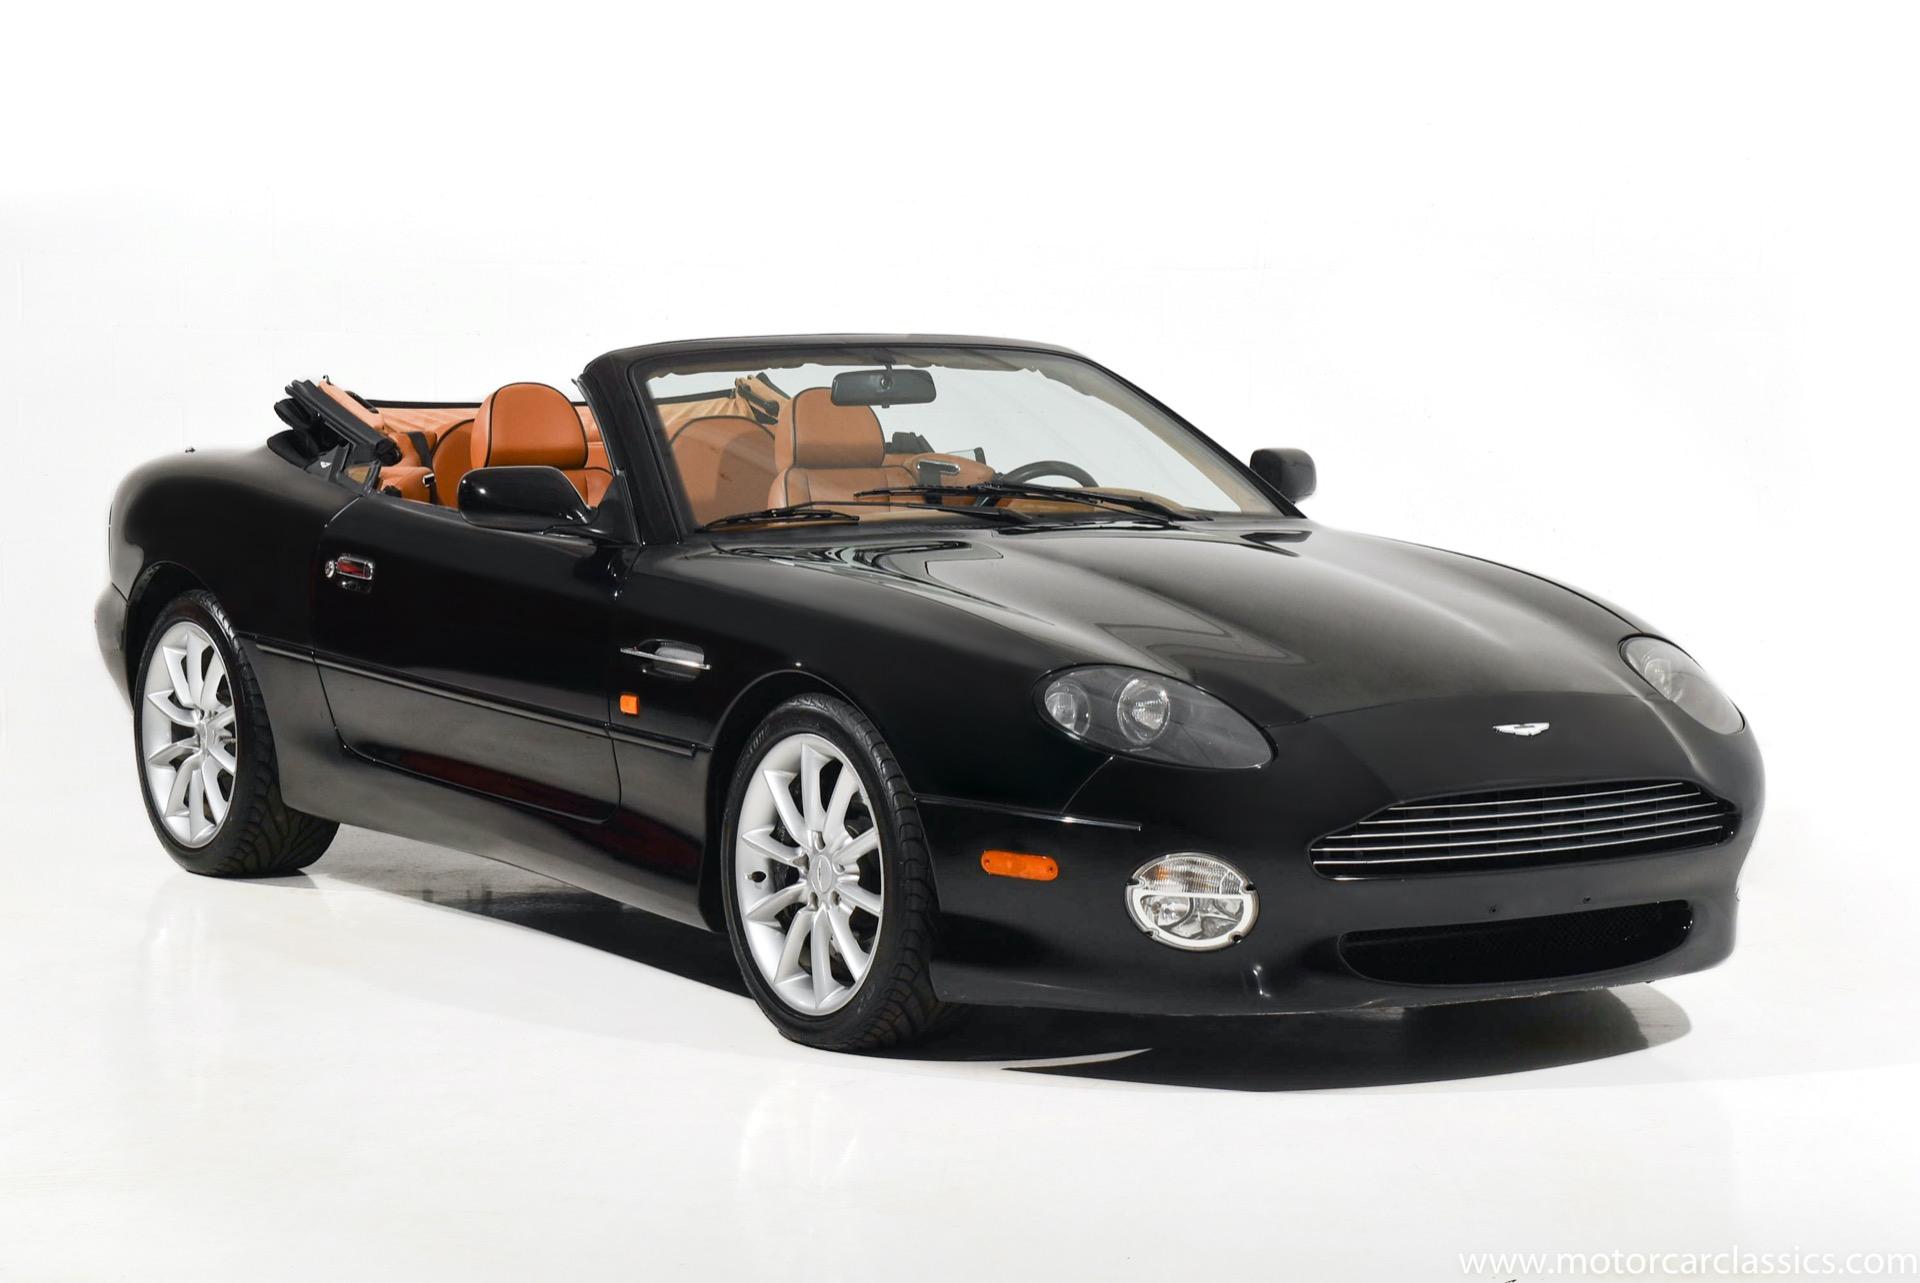 Used 2002 Aston Martin Db7 Vantage Volante For Sale 42 900 Motorcar Classics Stock 1623